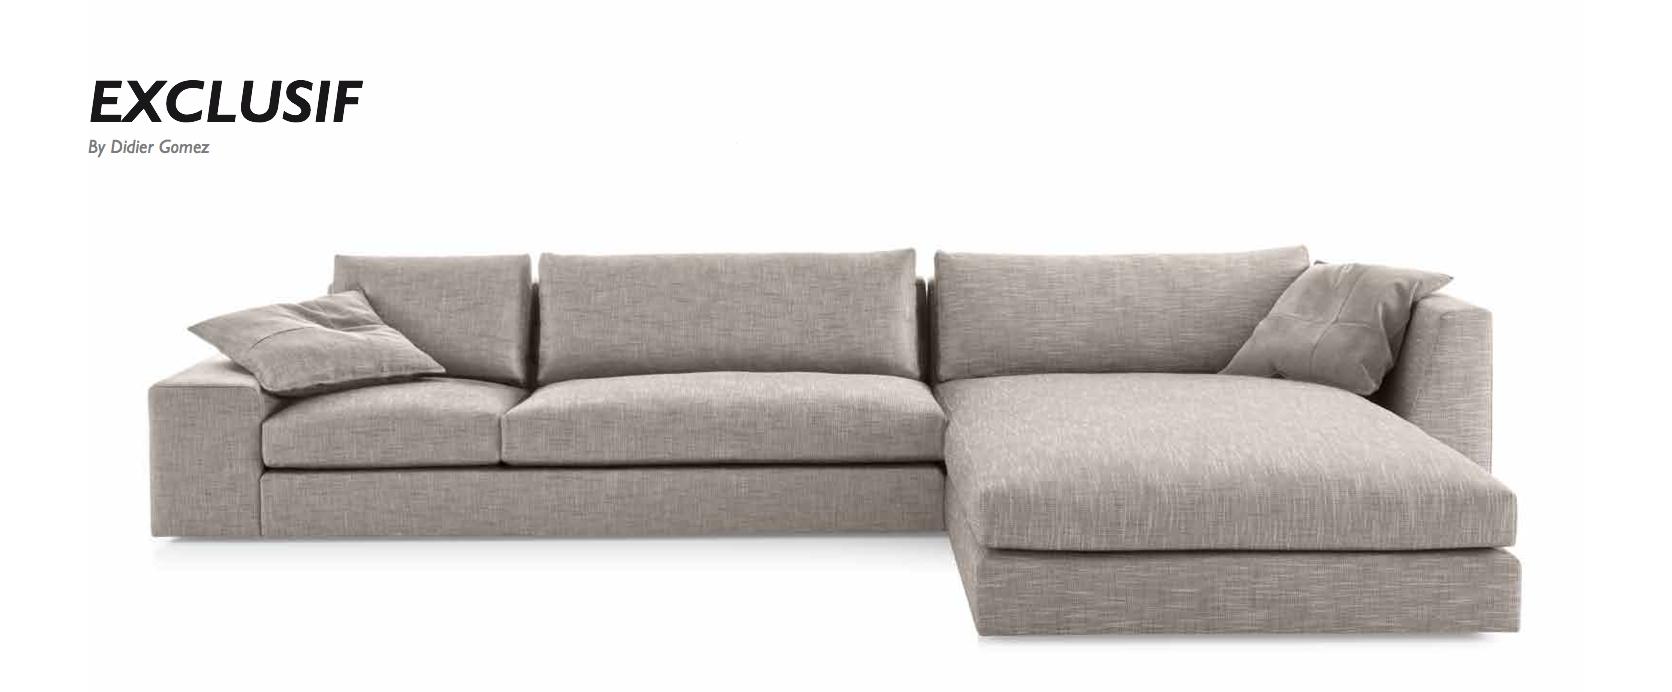 exclusif by didier gomez ligne roset quick ship program. Black Bedroom Furniture Sets. Home Design Ideas